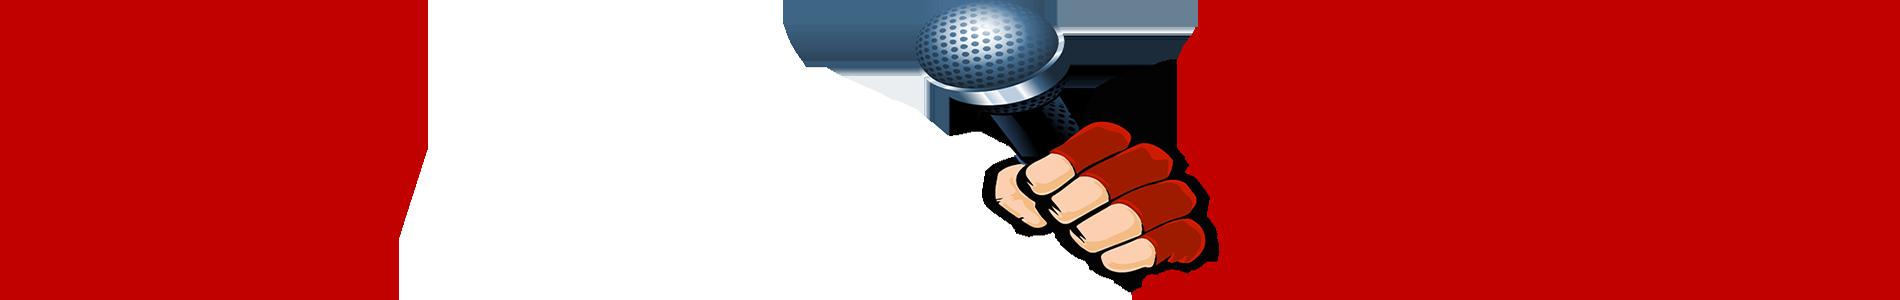 mymmanews logo